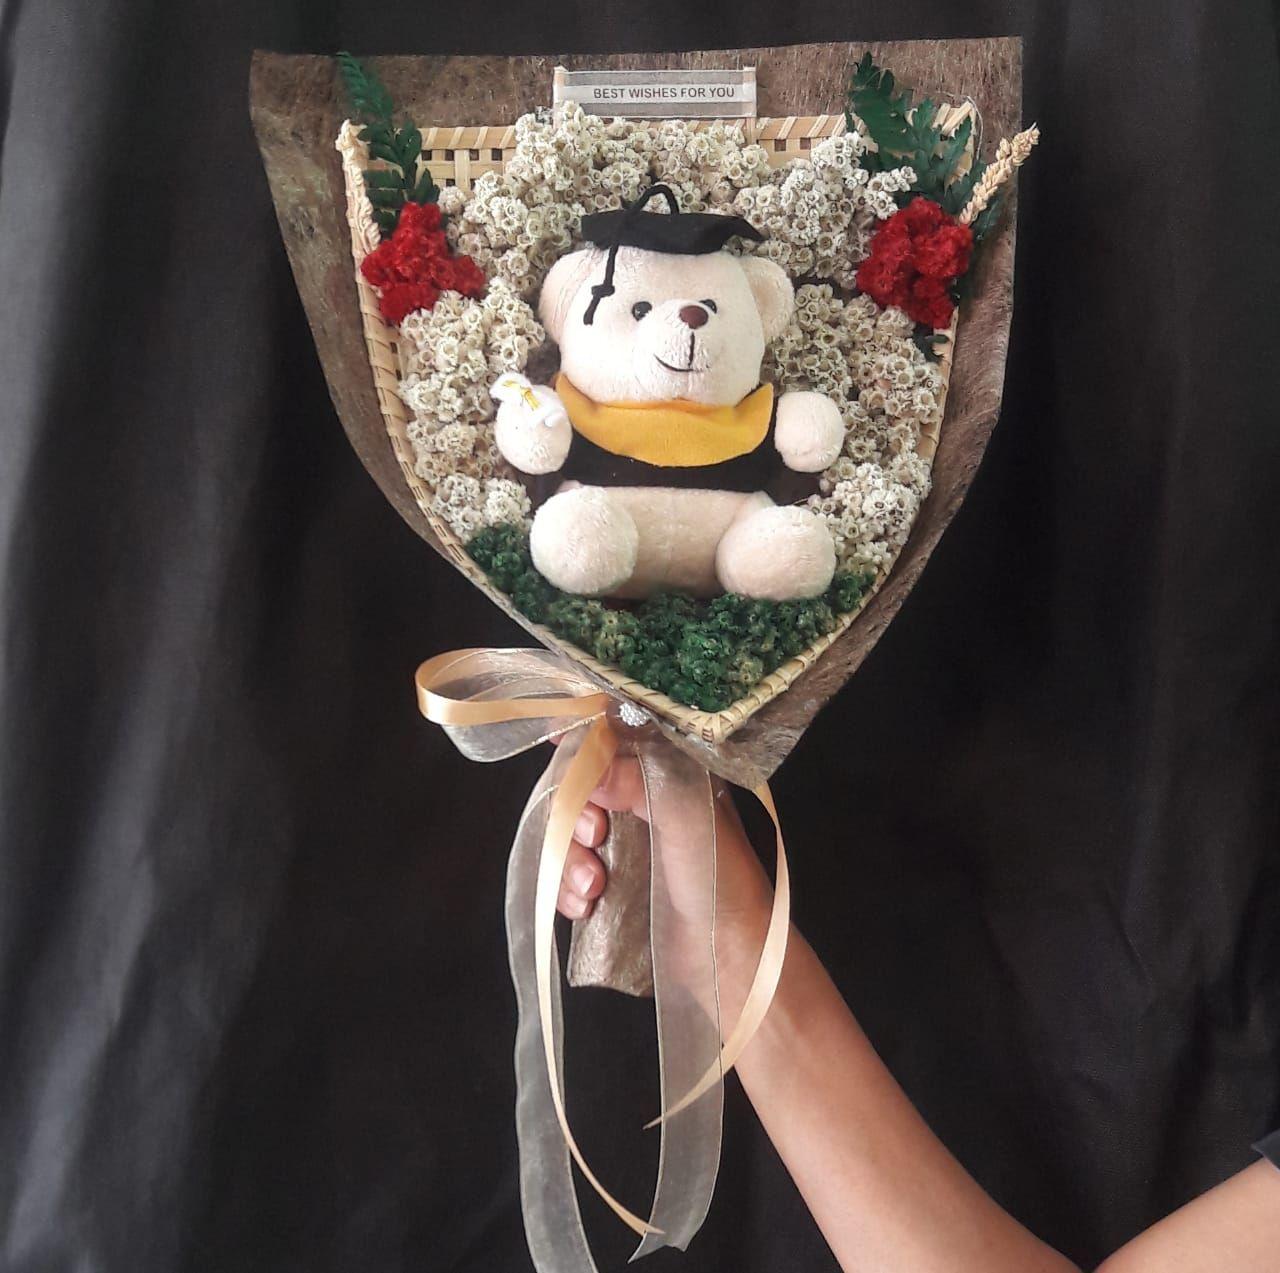 Bunga Edelweis Bunga Abadi Tipe Boneka Wisuda Hand Buket Edelweis Cocok Sebagai Kado Unik Untuk Pasangan Atau Sahabat Anda Laki La Ornamen Natal Buket Boneka